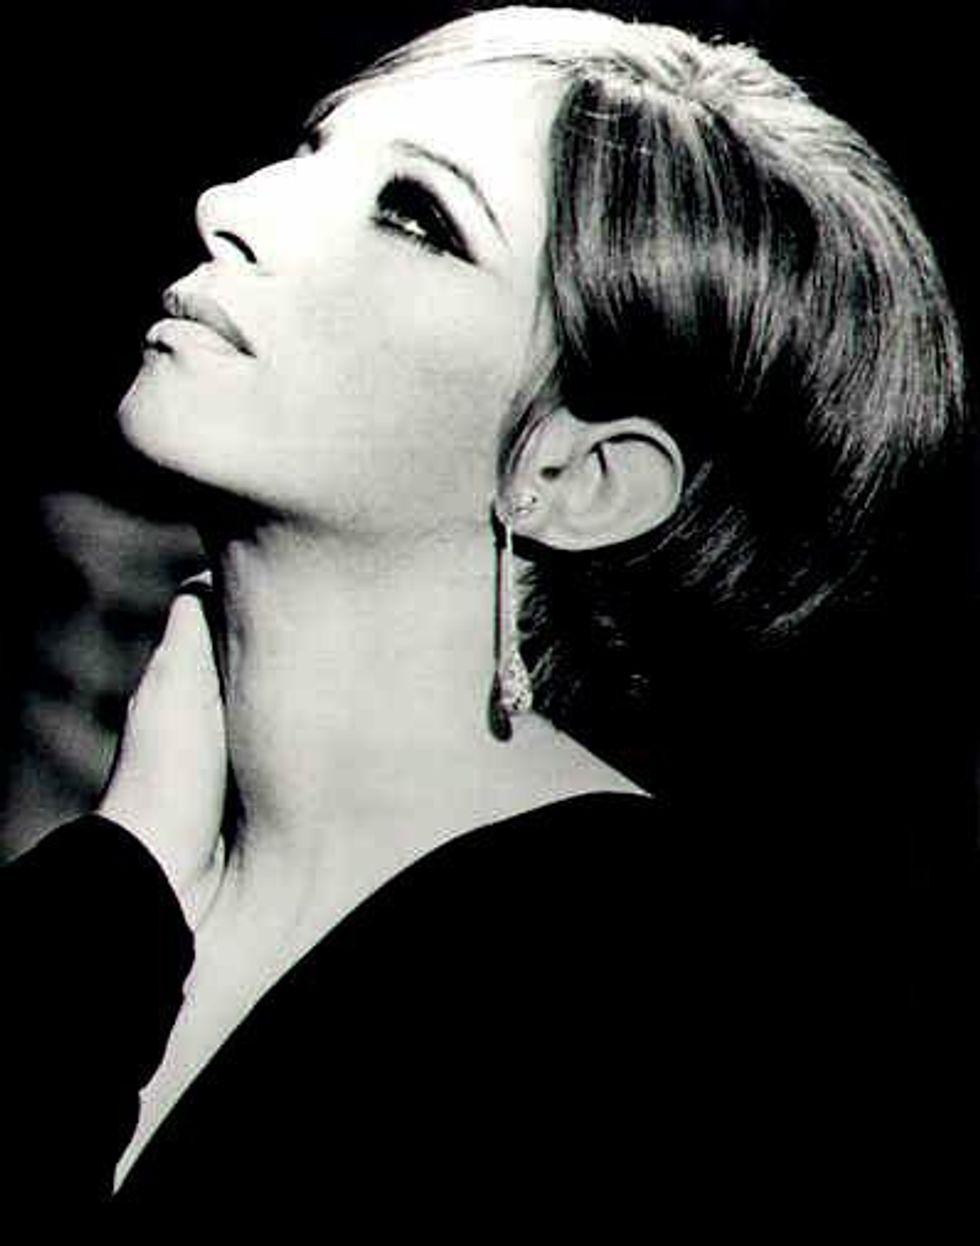 Barbra Streisand's Show in Atlantic City